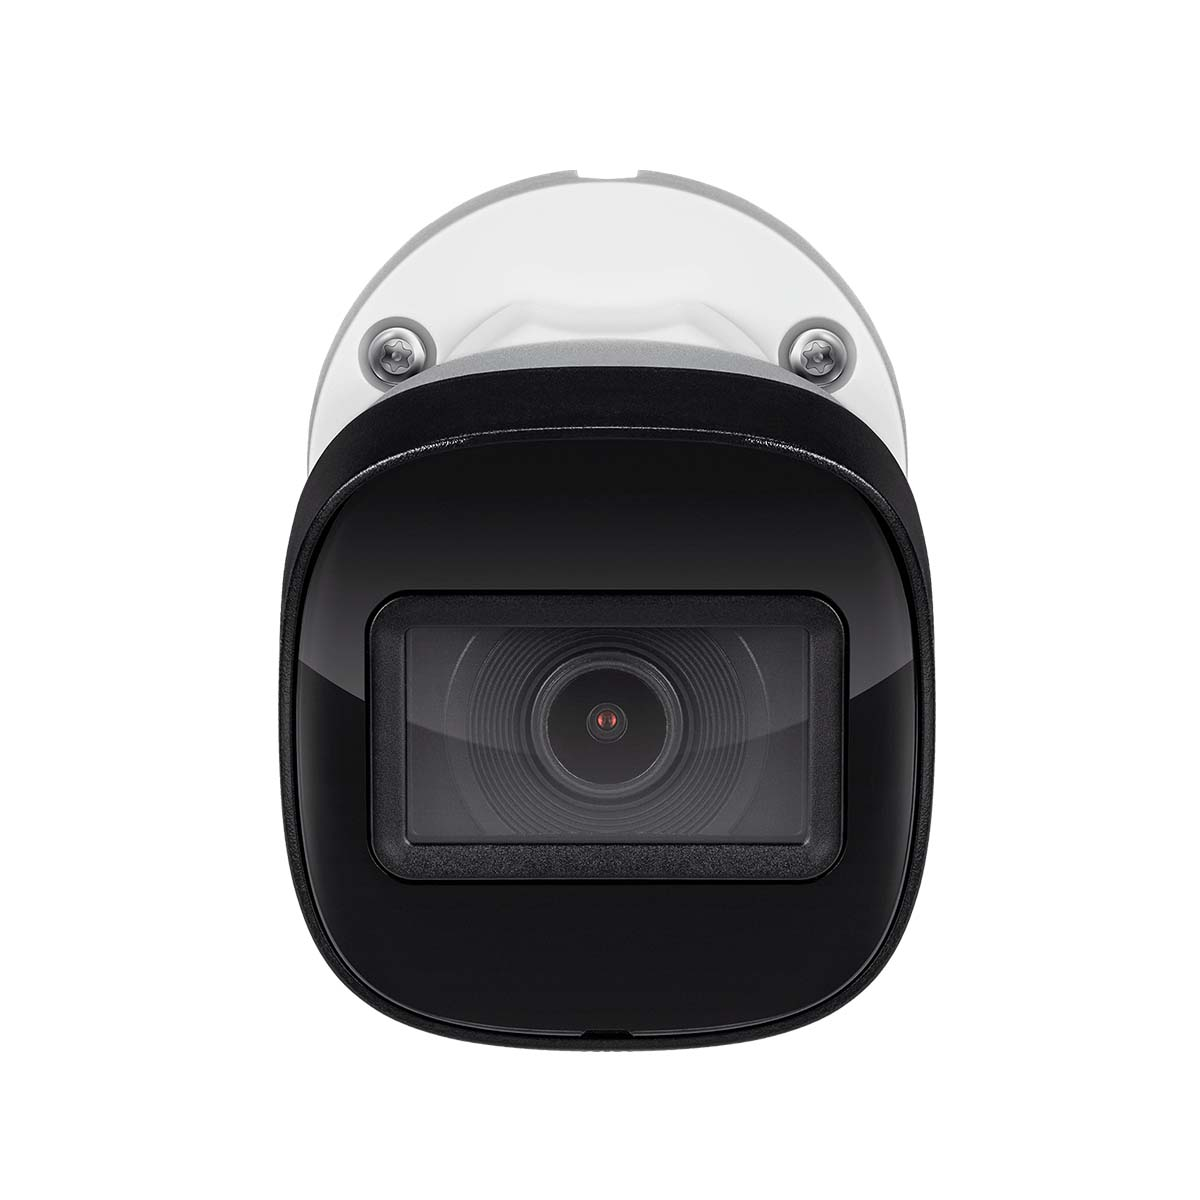 Kit 04 Câmera Bullet Intelbras Vhd 1120 B G6 720p 2.8mm